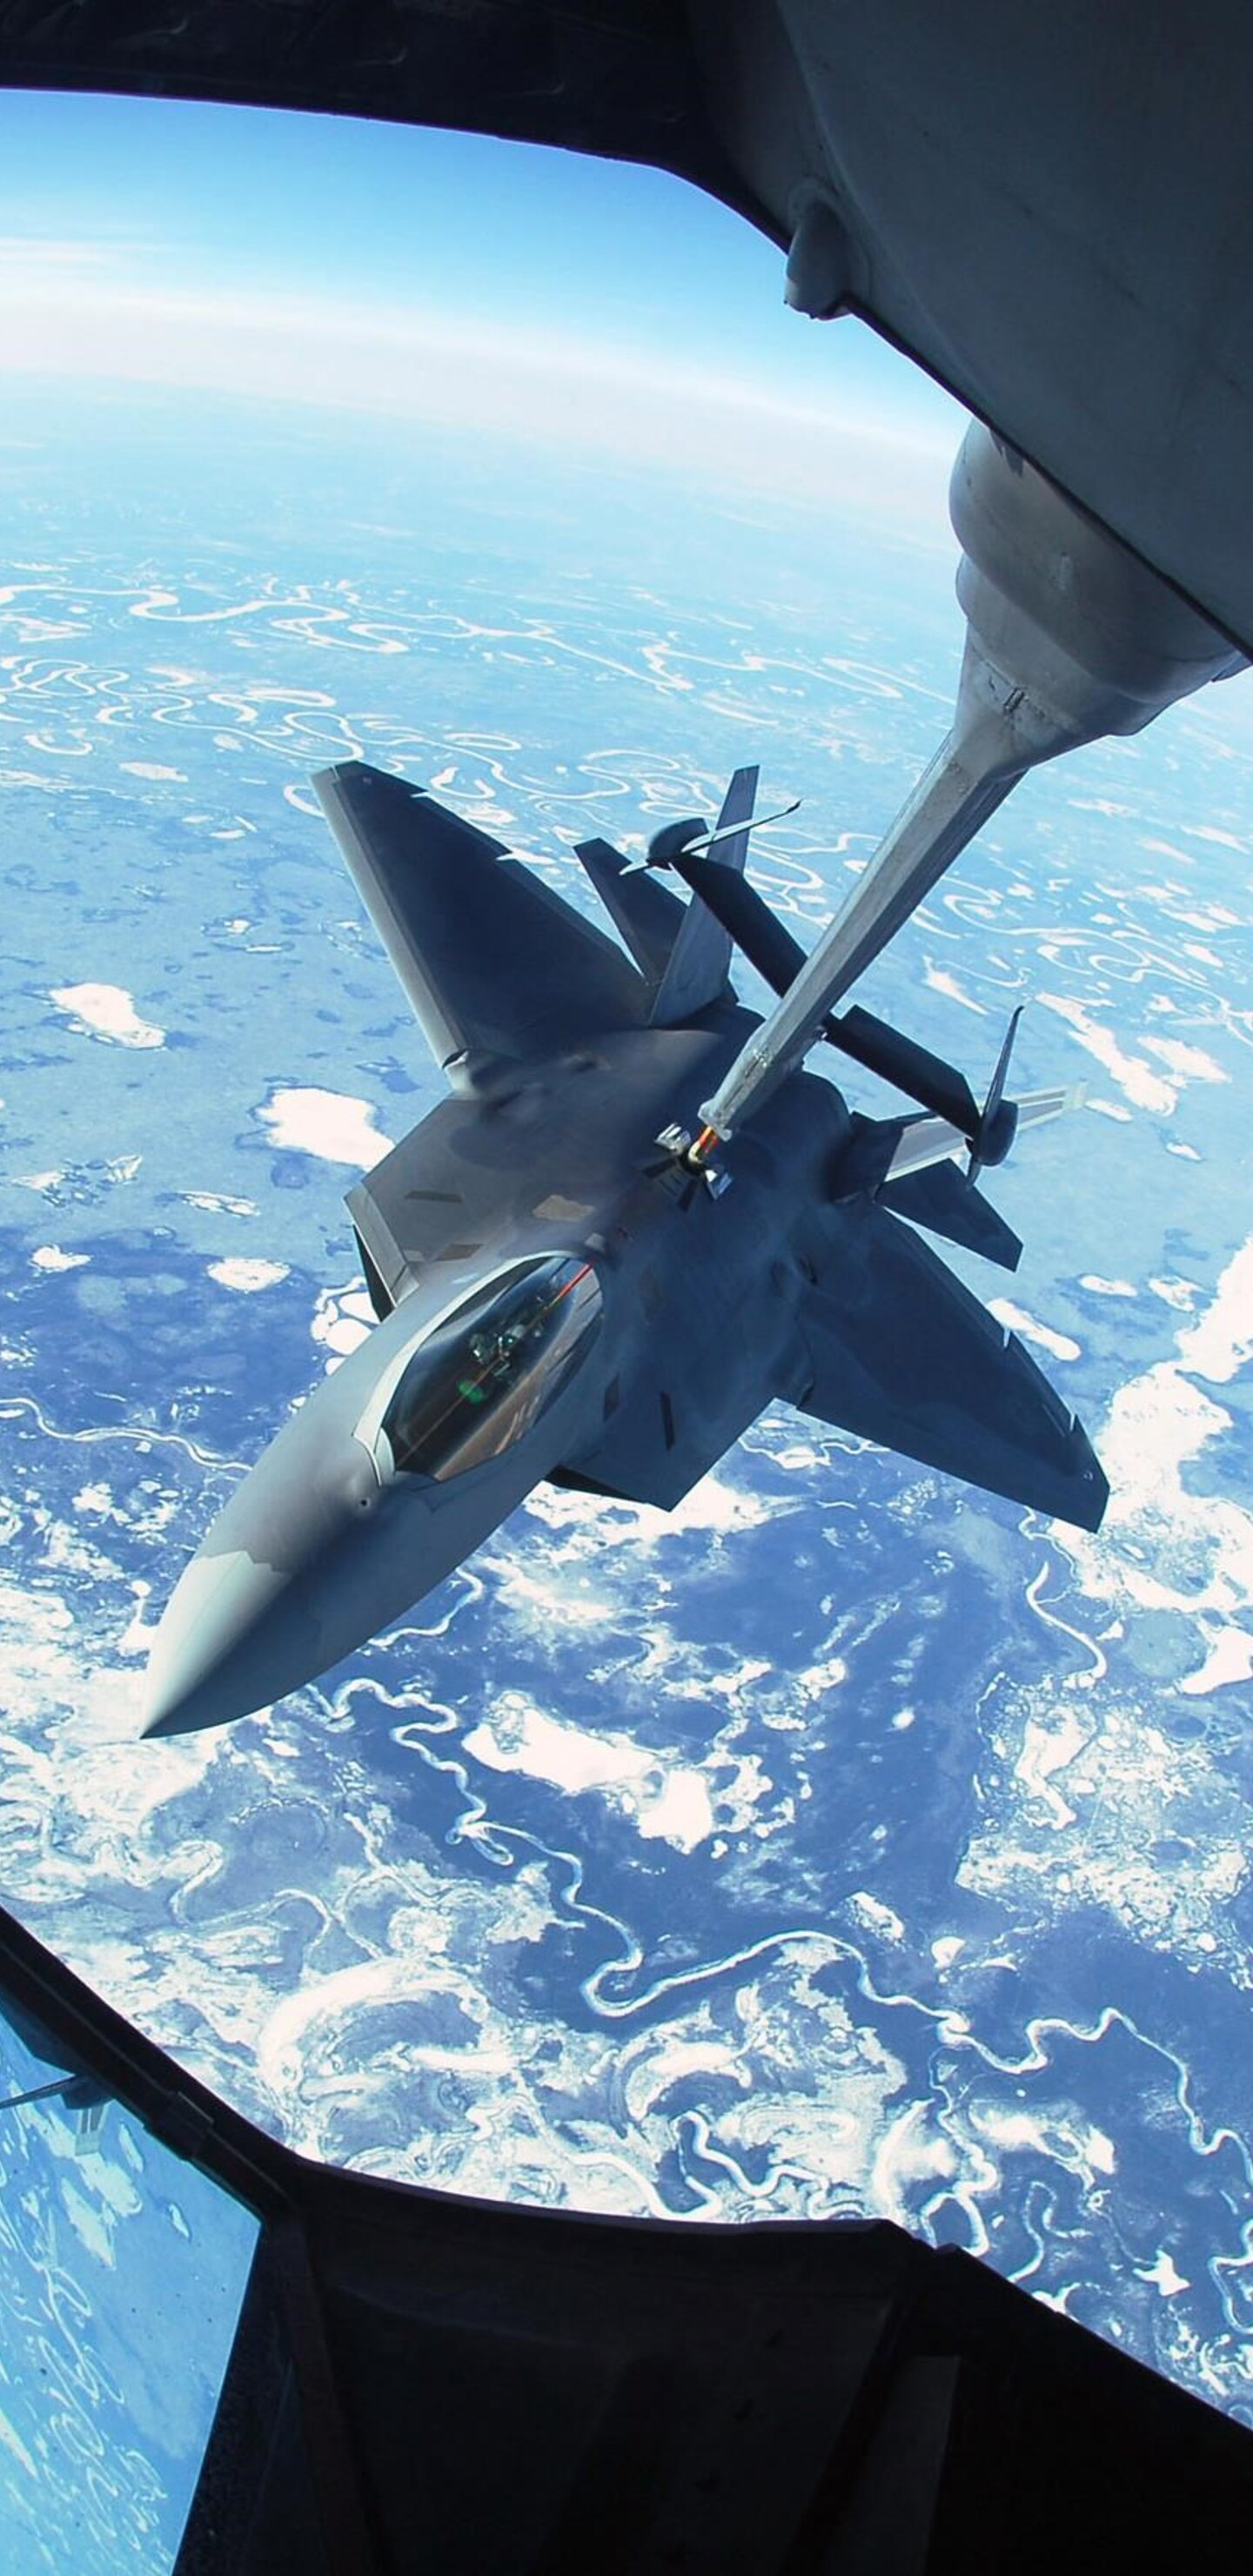 lockheed-martin-f-22-raptor-hd.jpg